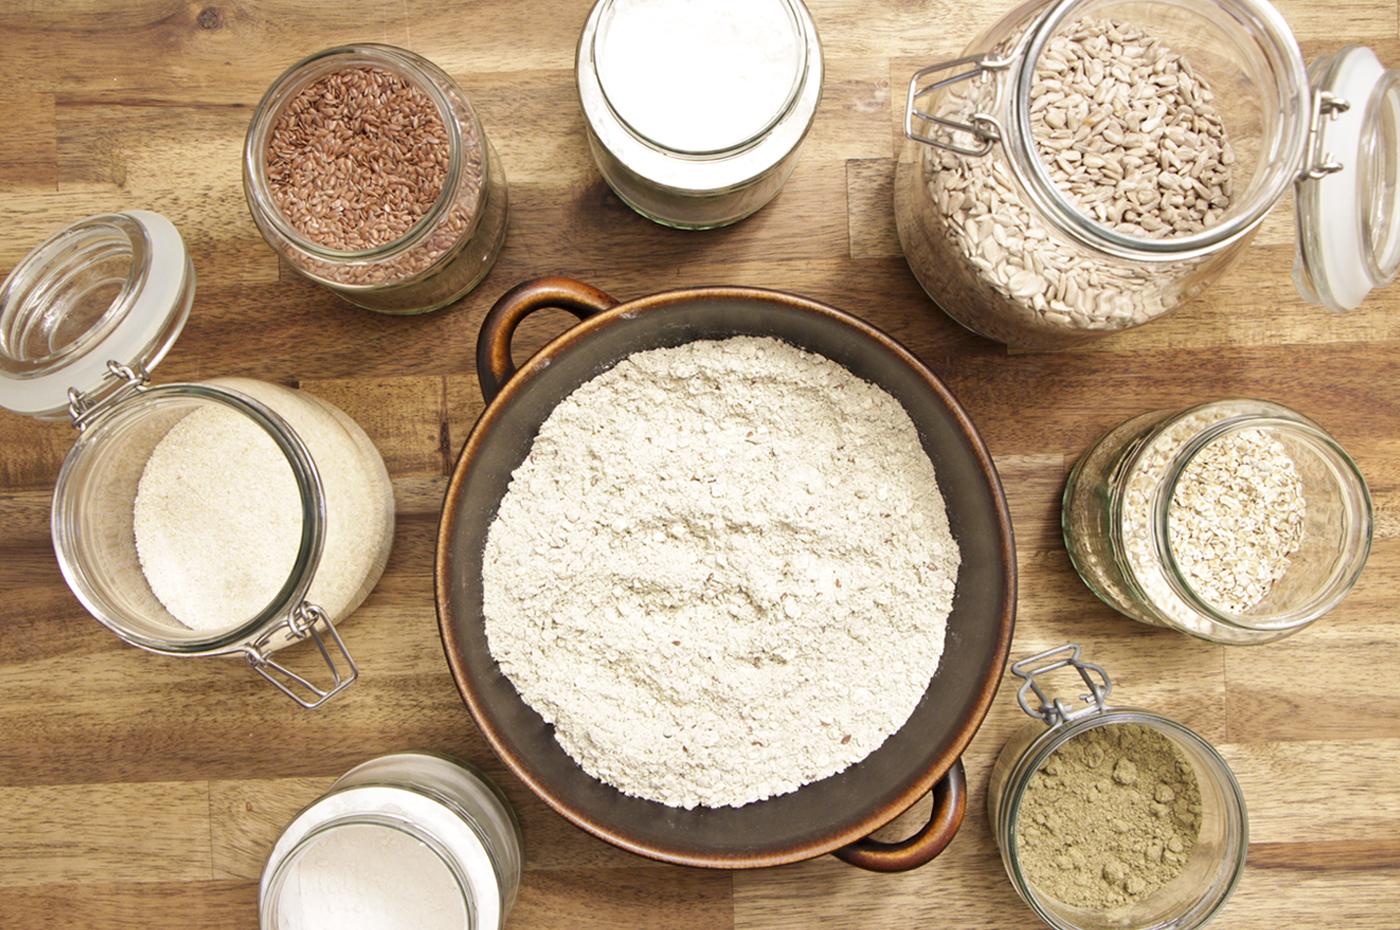 Brotbackmischung_Zutaten_glutenfrei_Jalda_AkkarahnNSJkxhRP4Lv